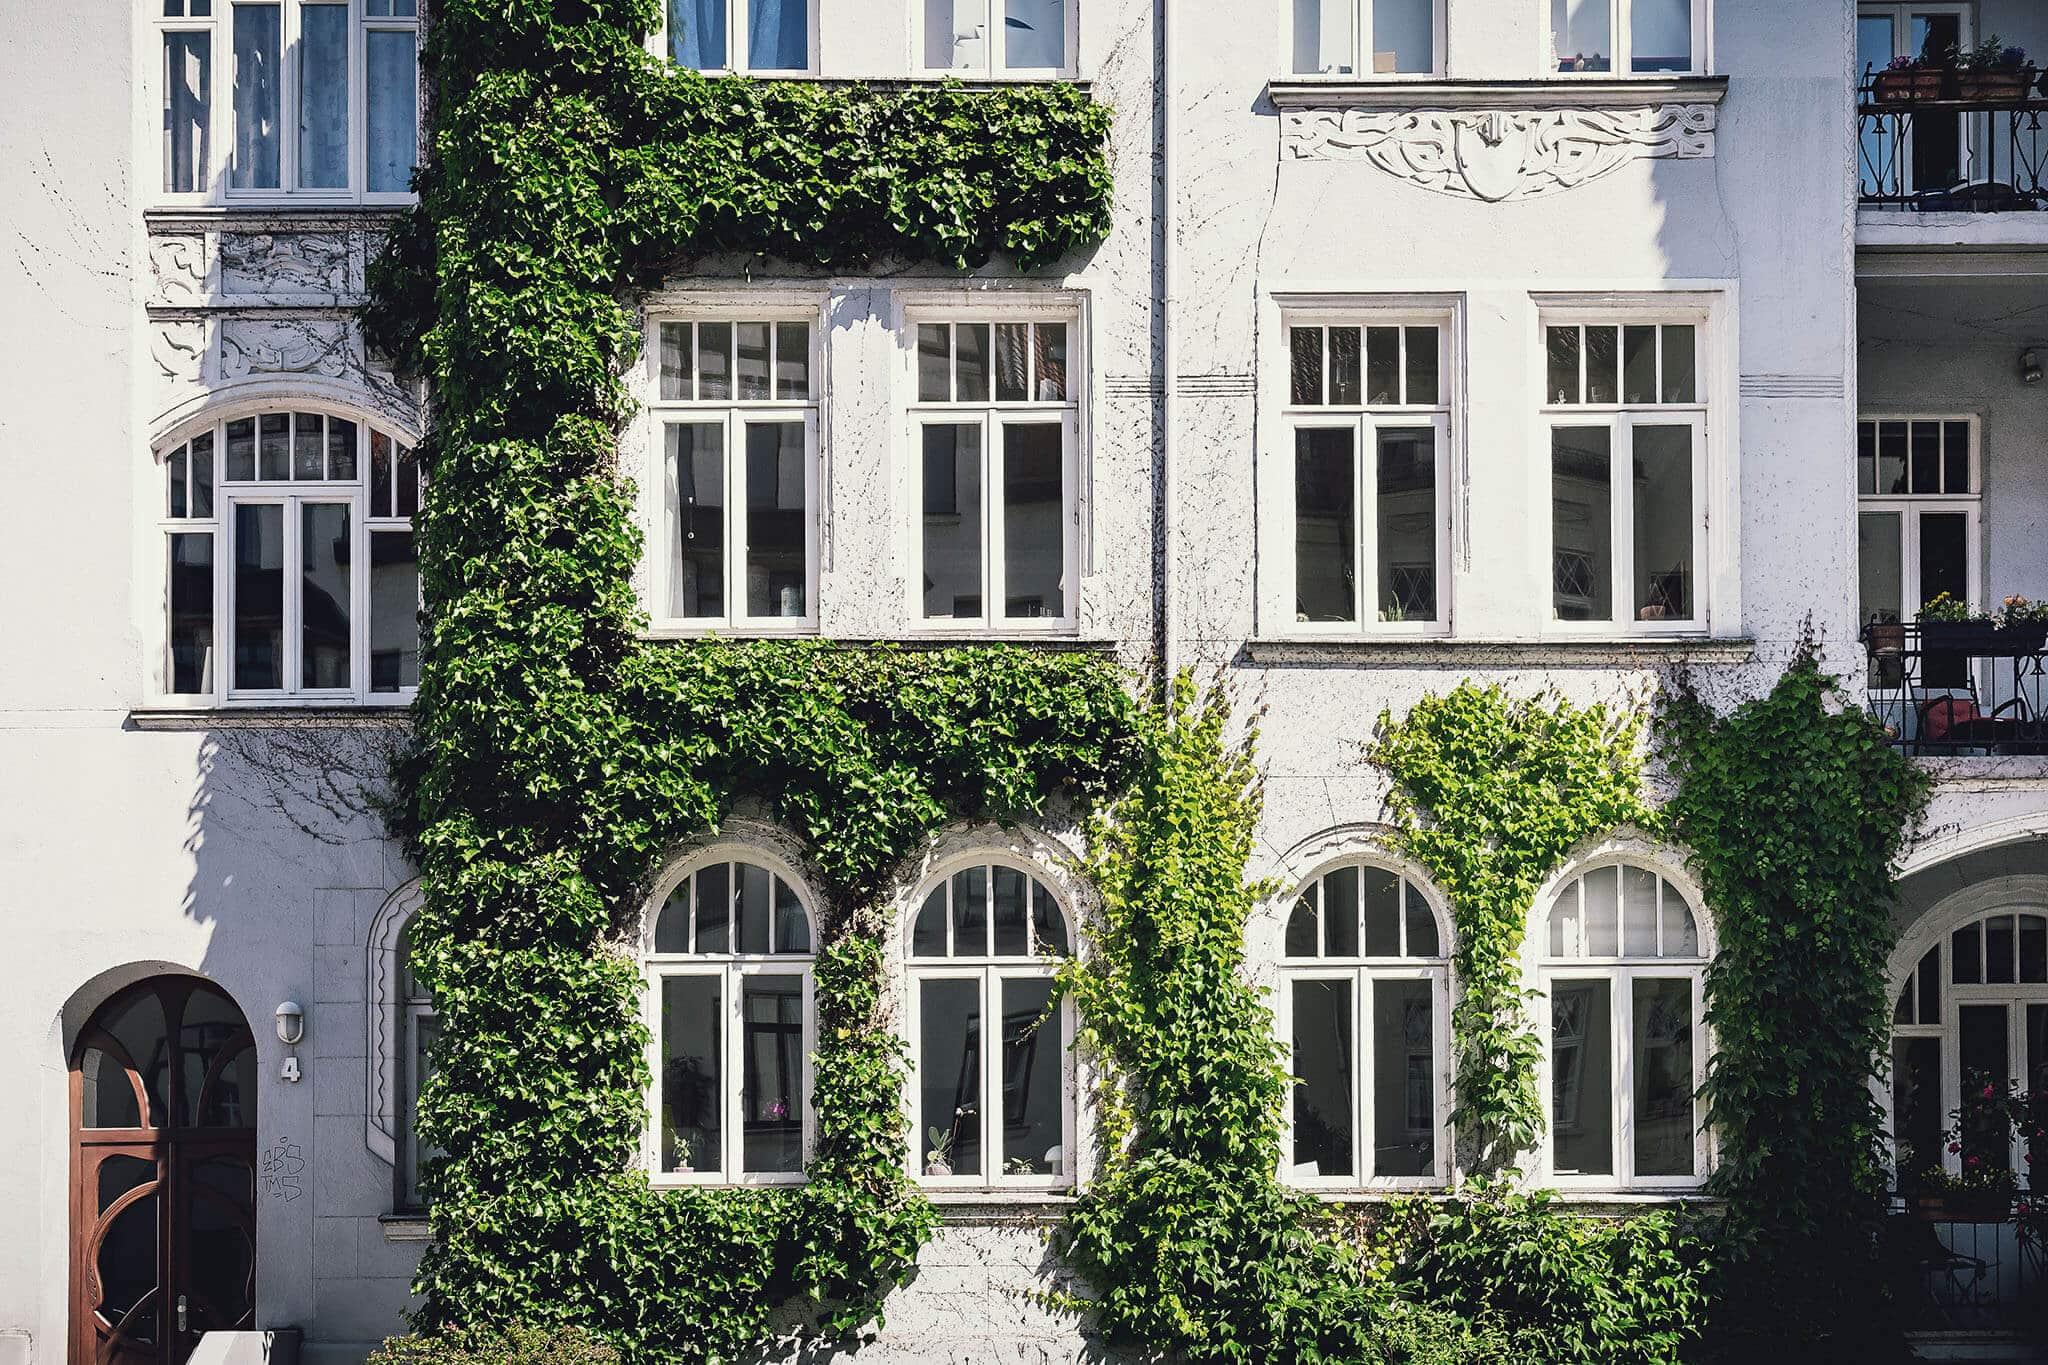 Haasemannstraße - Grüne Stadt Hannover